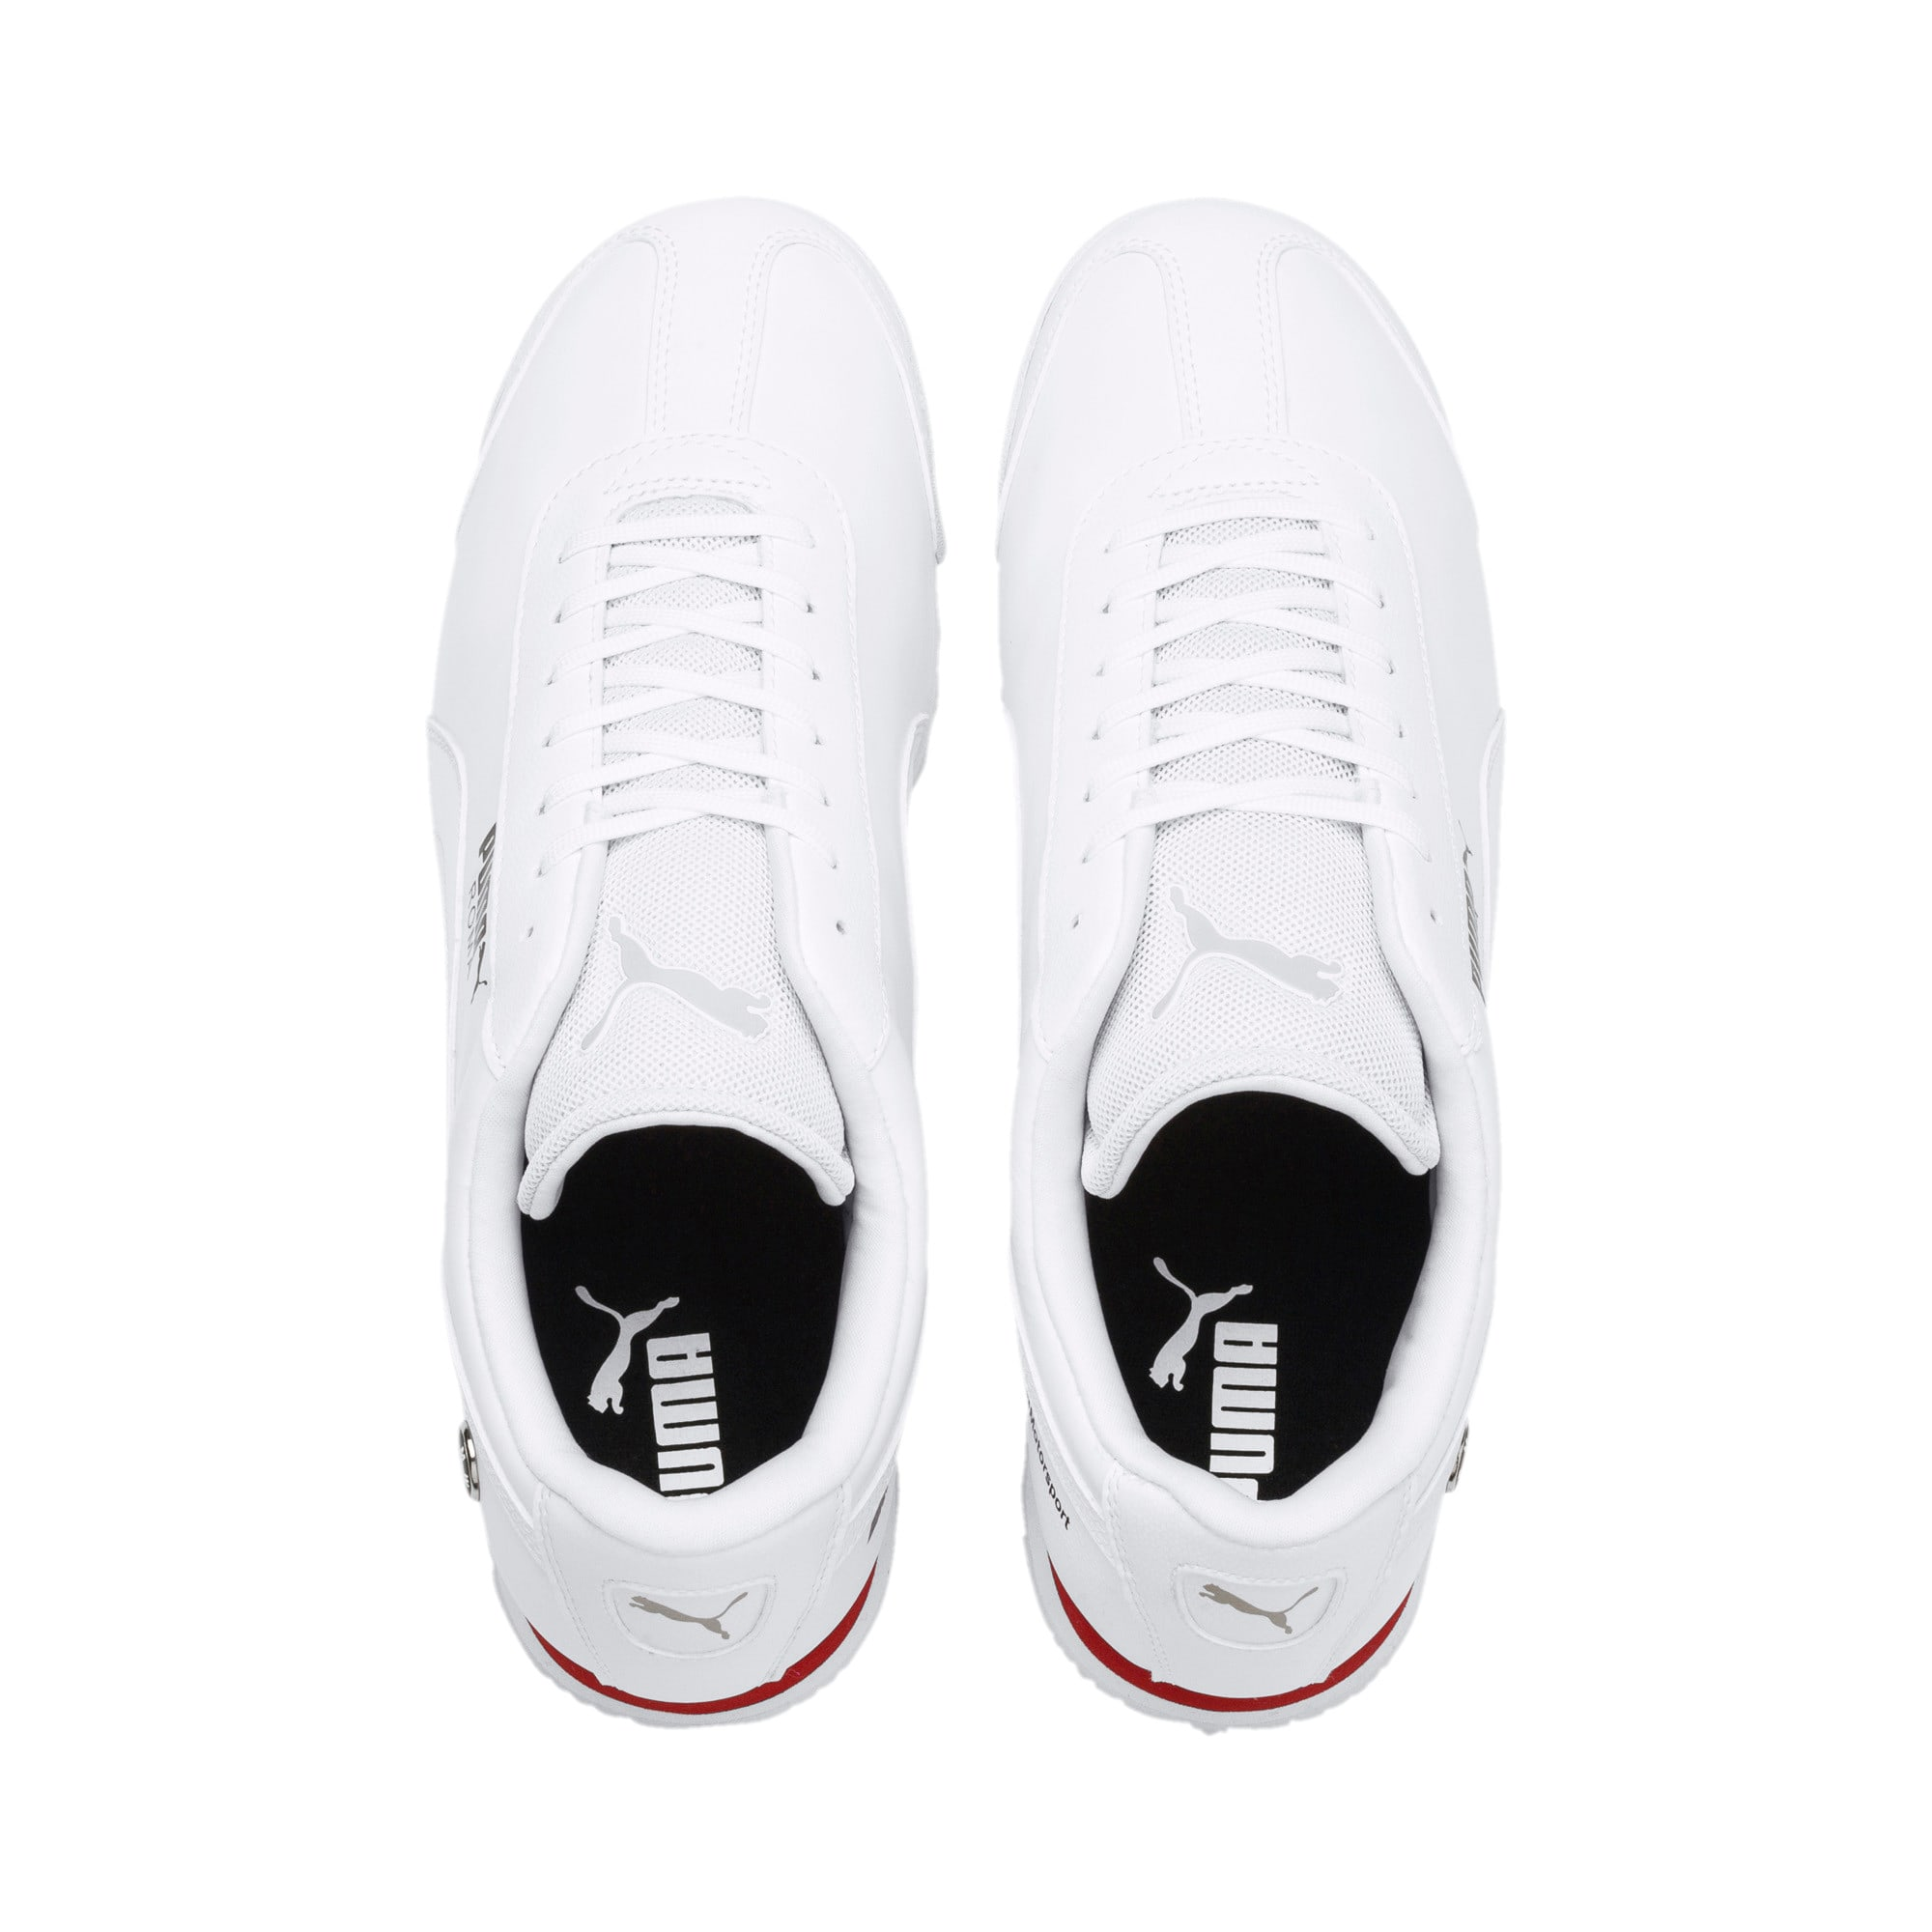 Thumbnail 6 of BMW M Motorsport Roma Herren Sneaker, Puma White-Puma White, medium